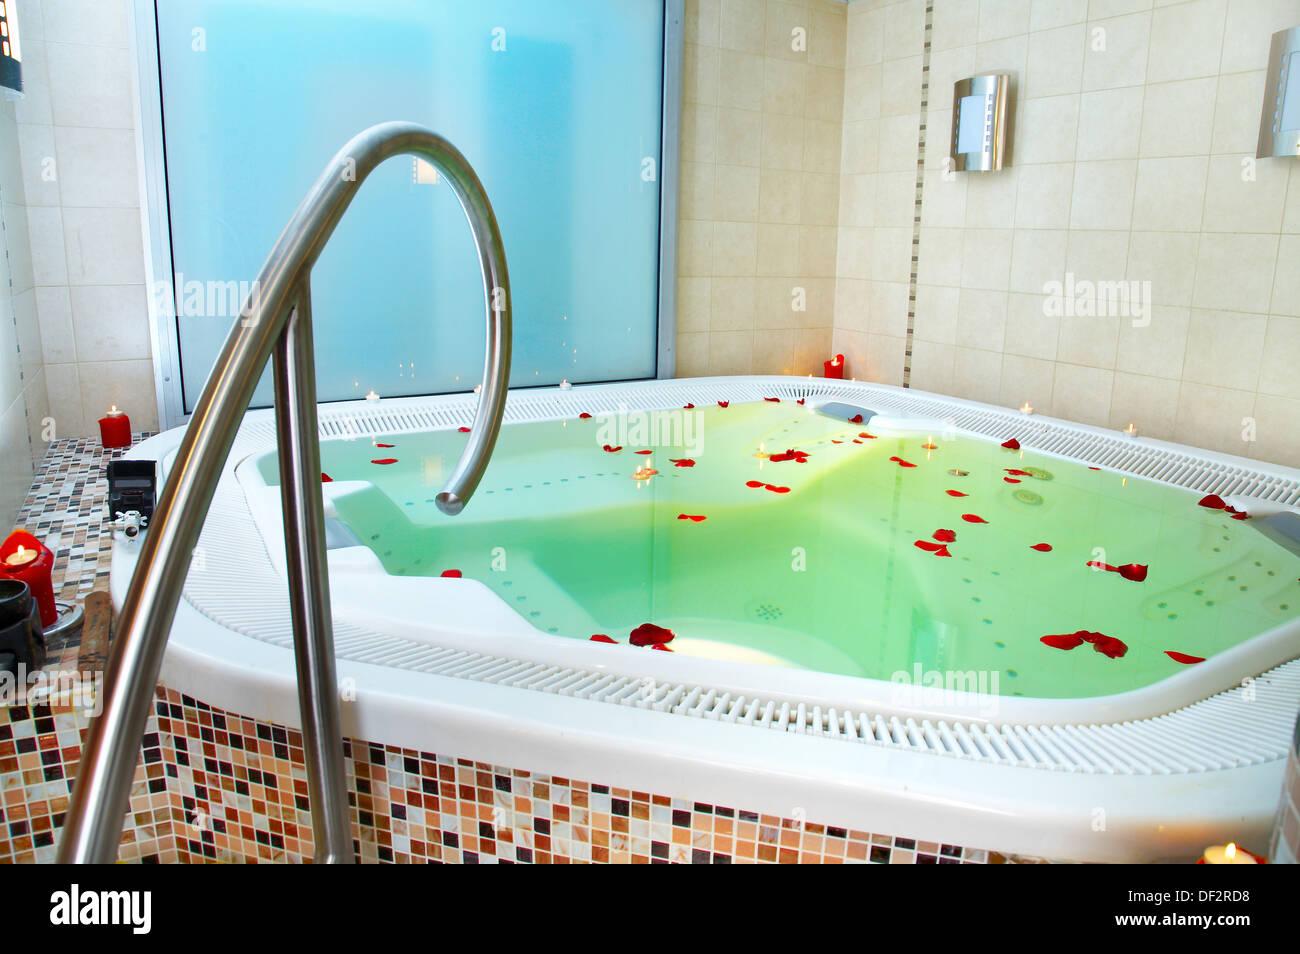 Vasca da bagno di jacuzzi con petali di rose foto immagine stock